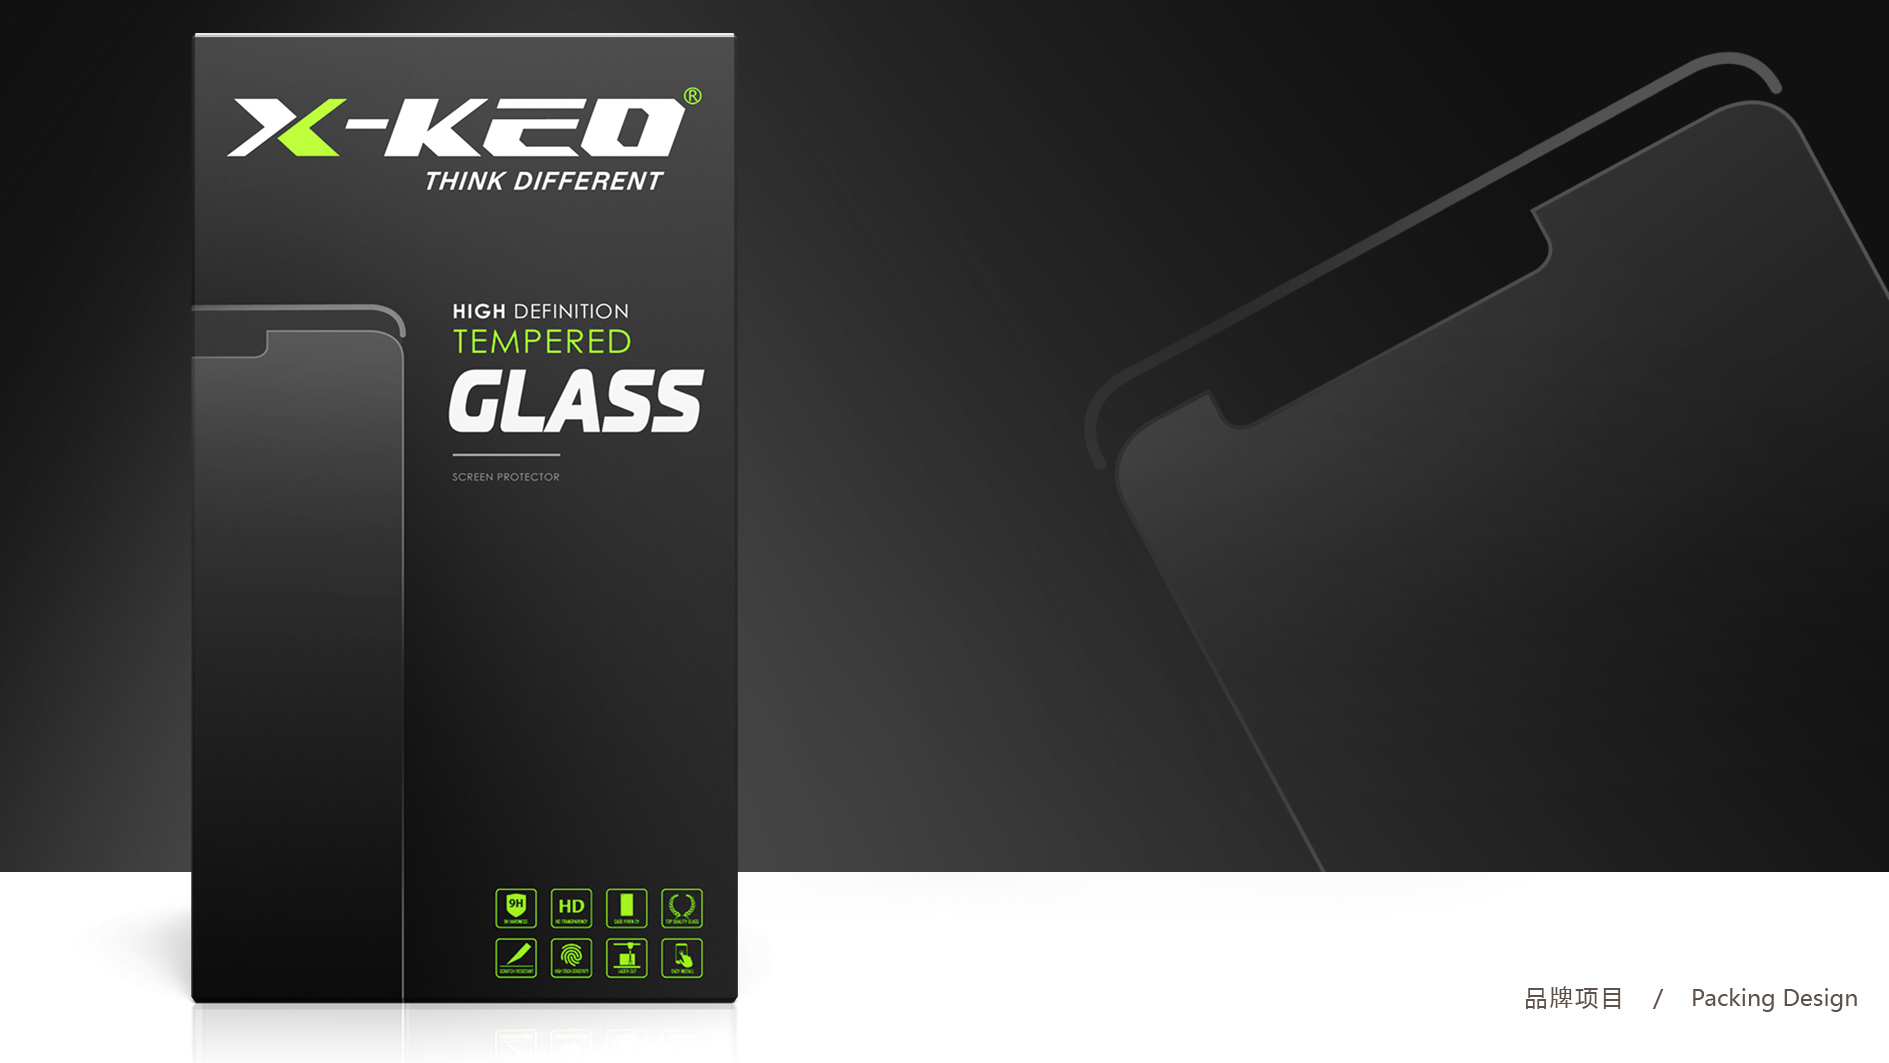 XKEO包装设计